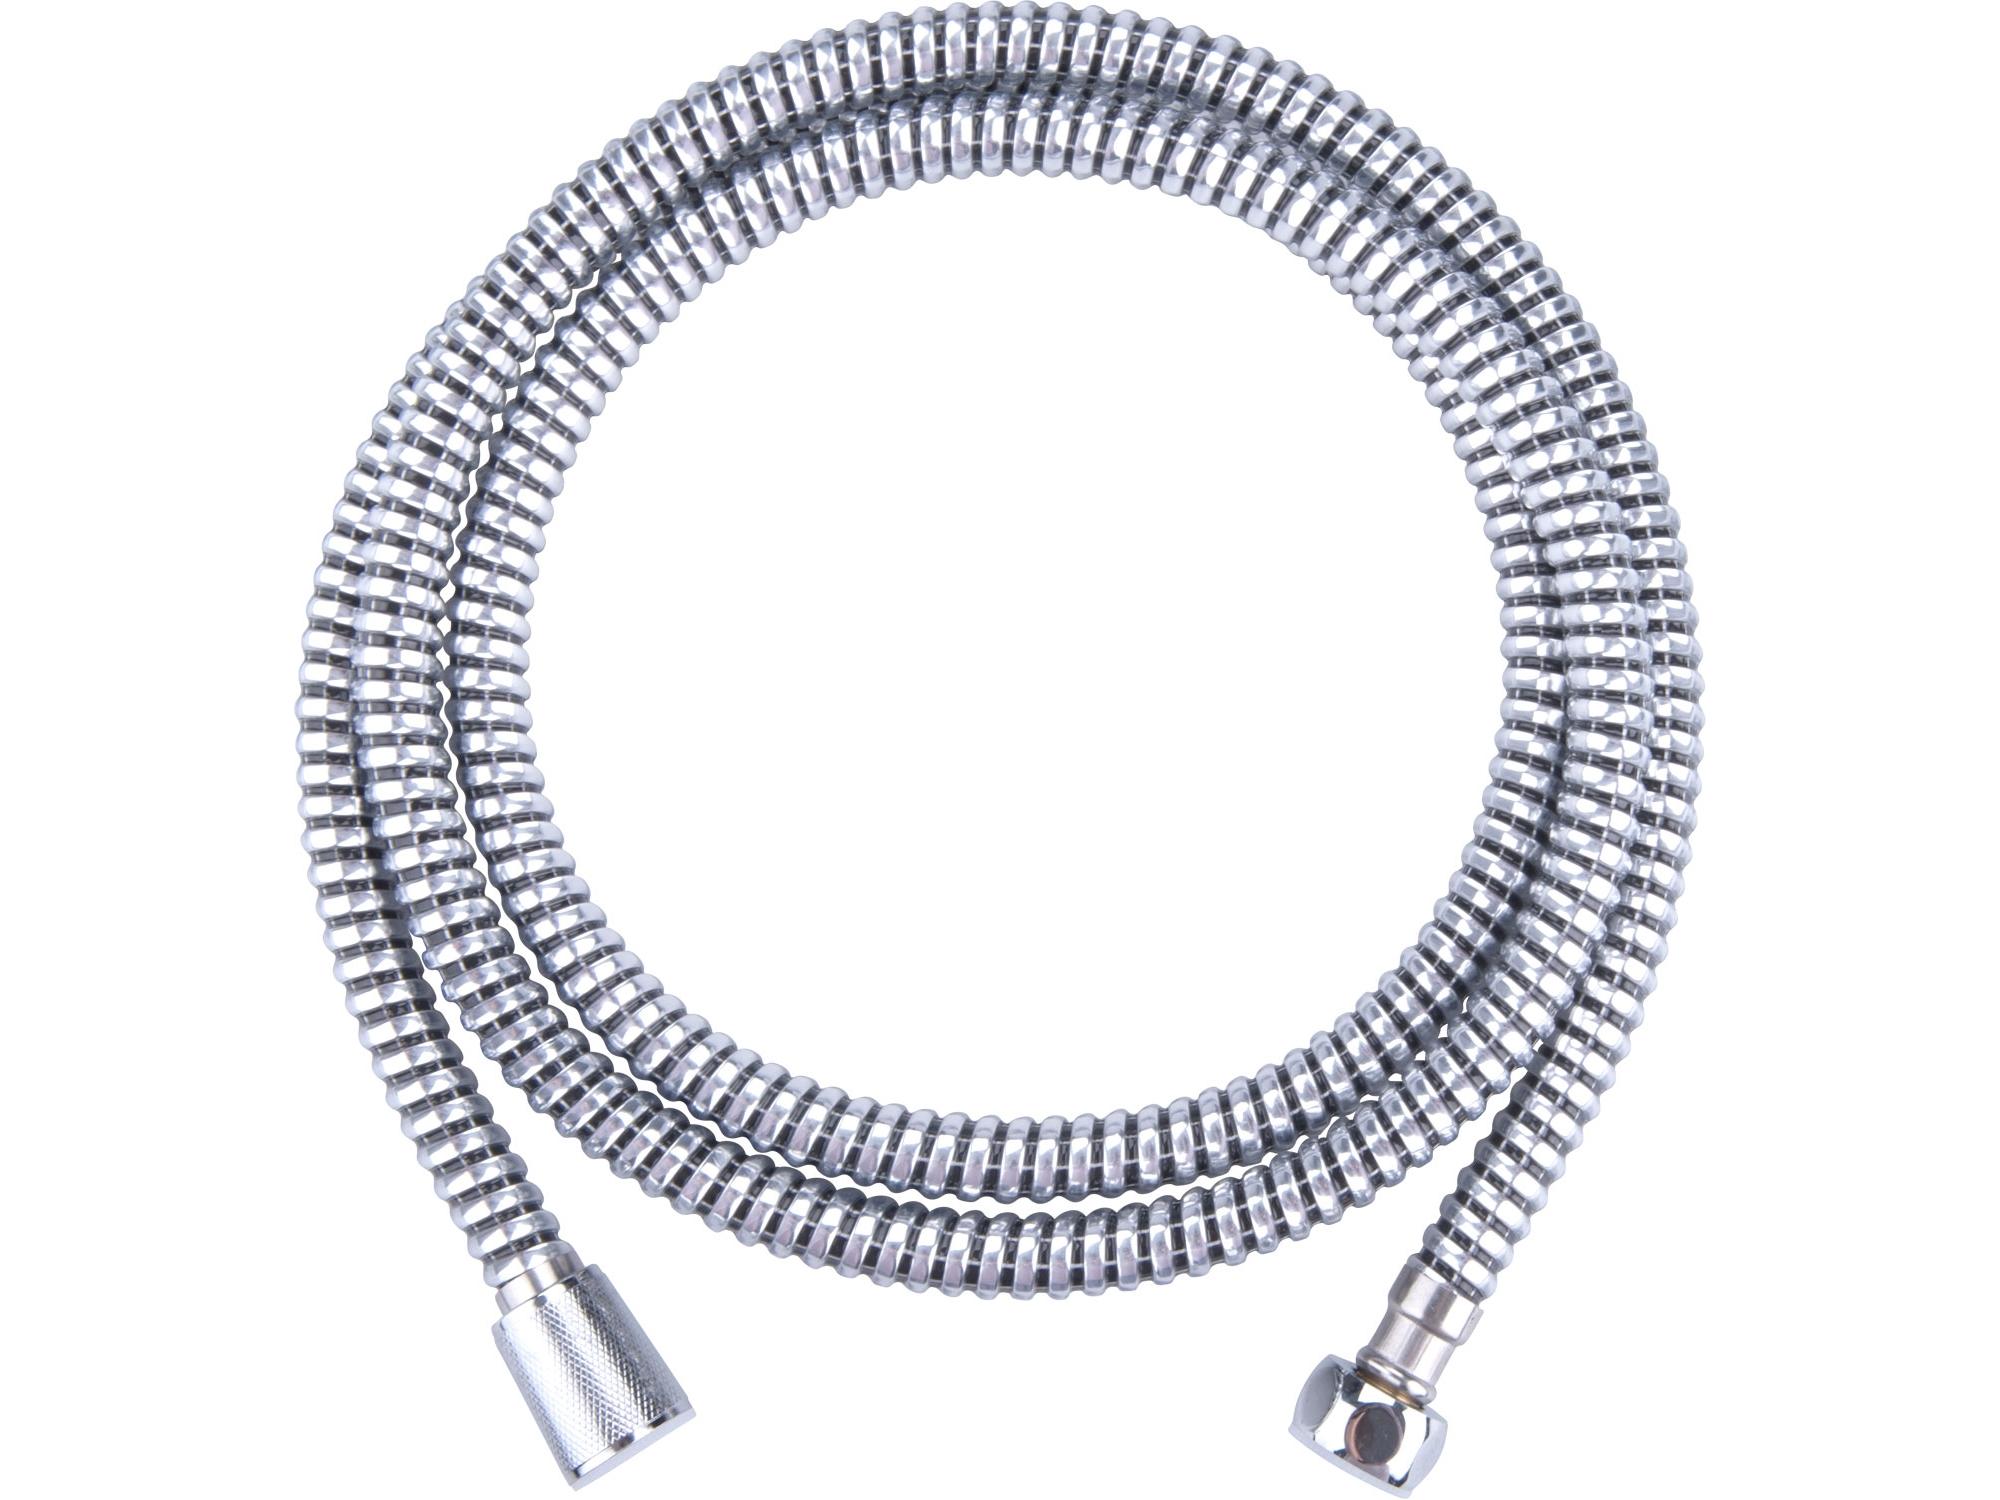 hadice sprchová, černo/stříbrná, 180cm, PVC